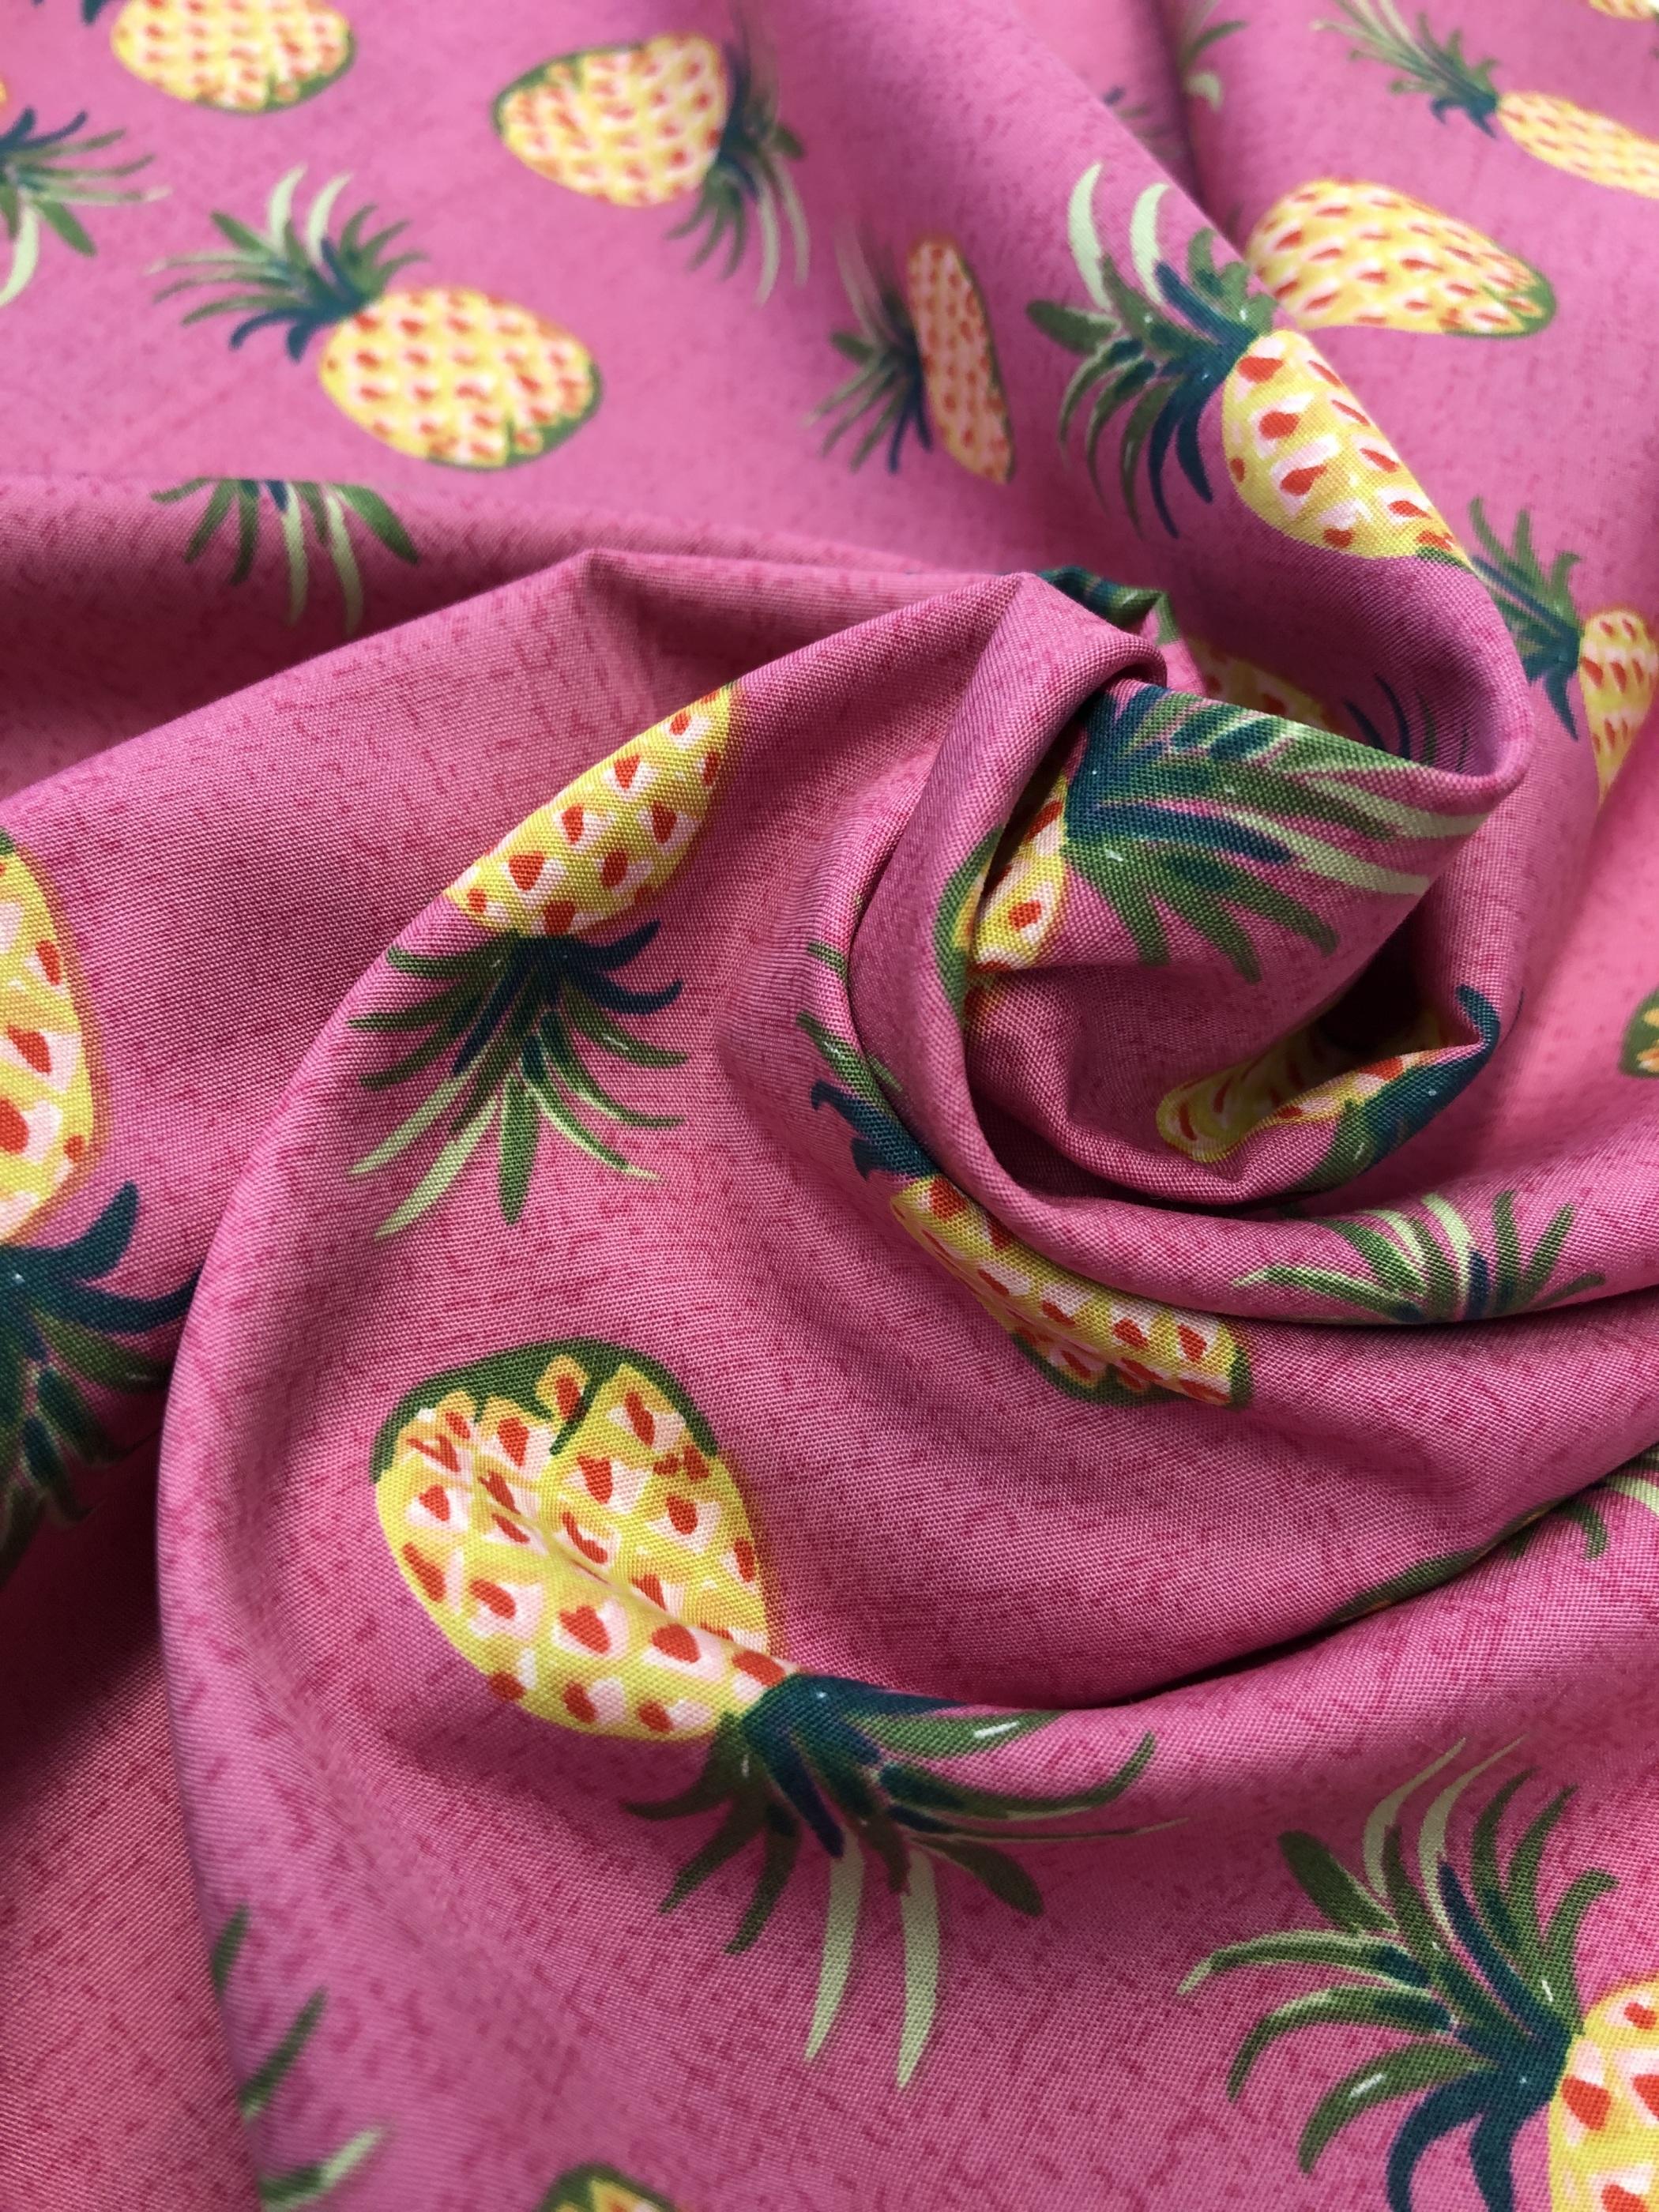 rosa cerise ananas bomull bomullsväv metervara gul modetyg tyglust laholm